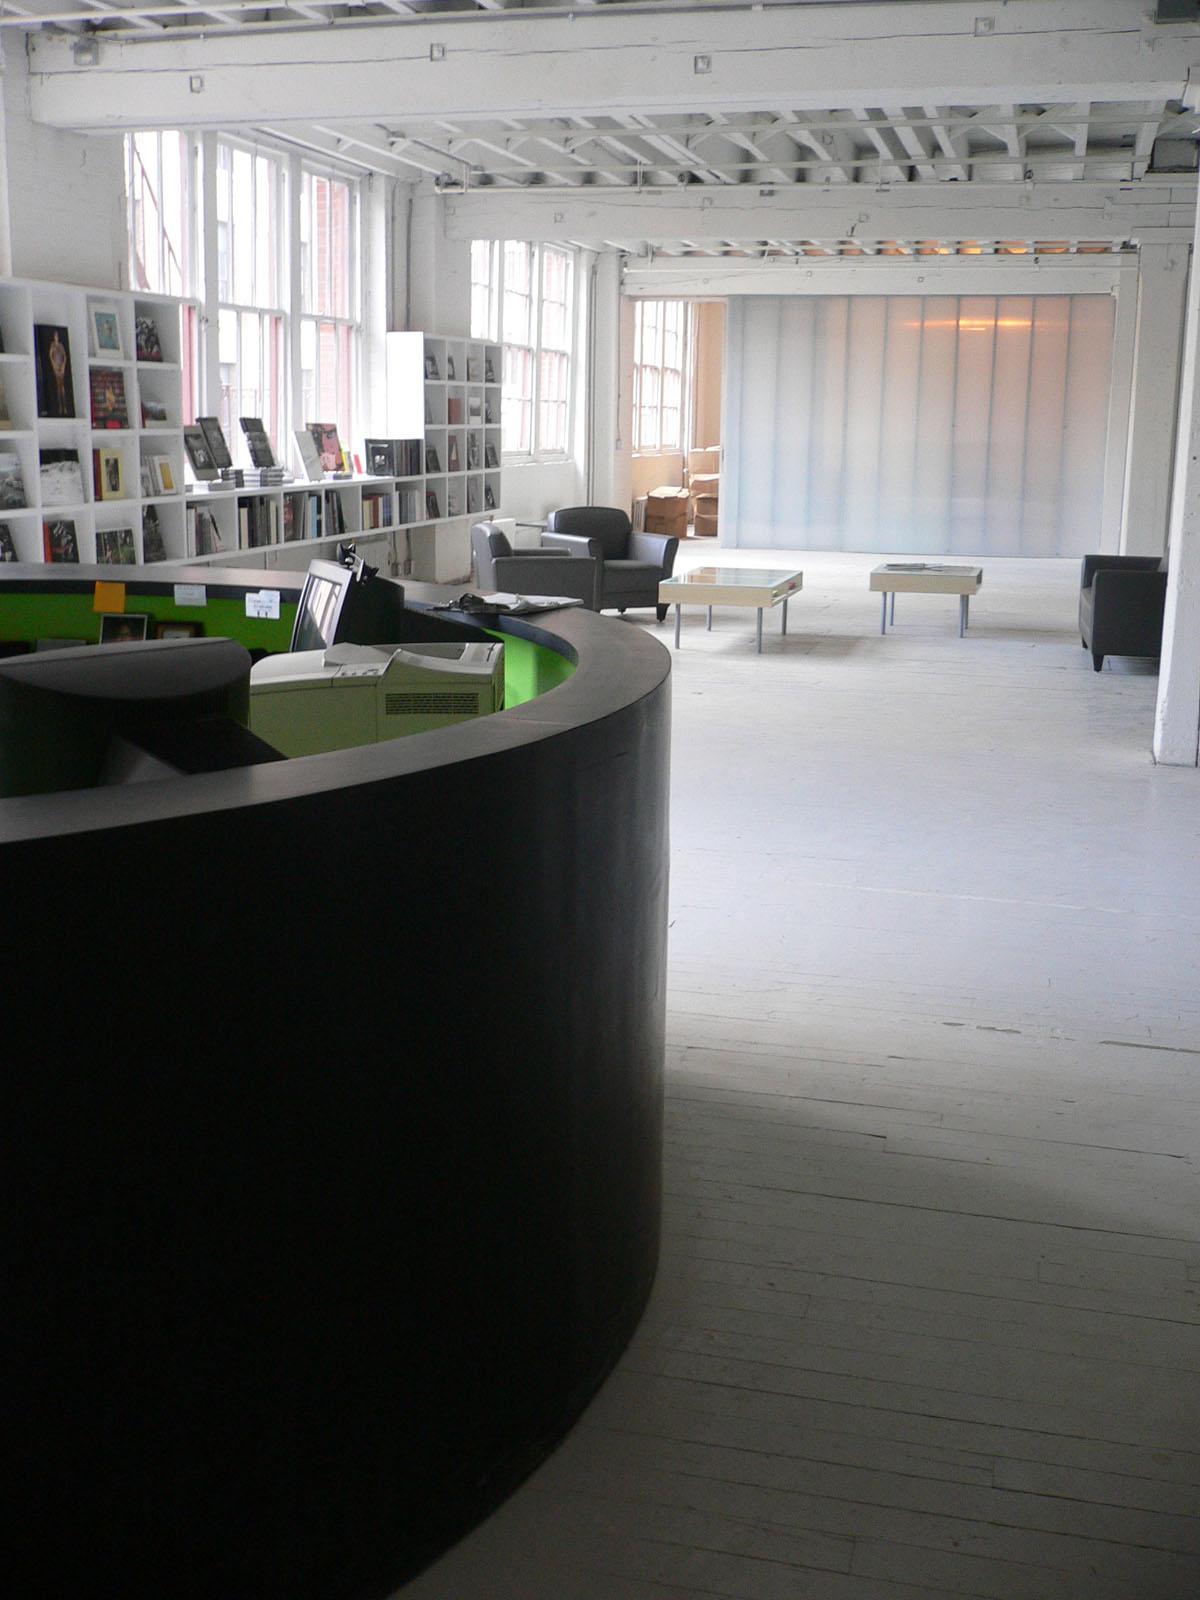 Aperture desk 3 copy.jpg